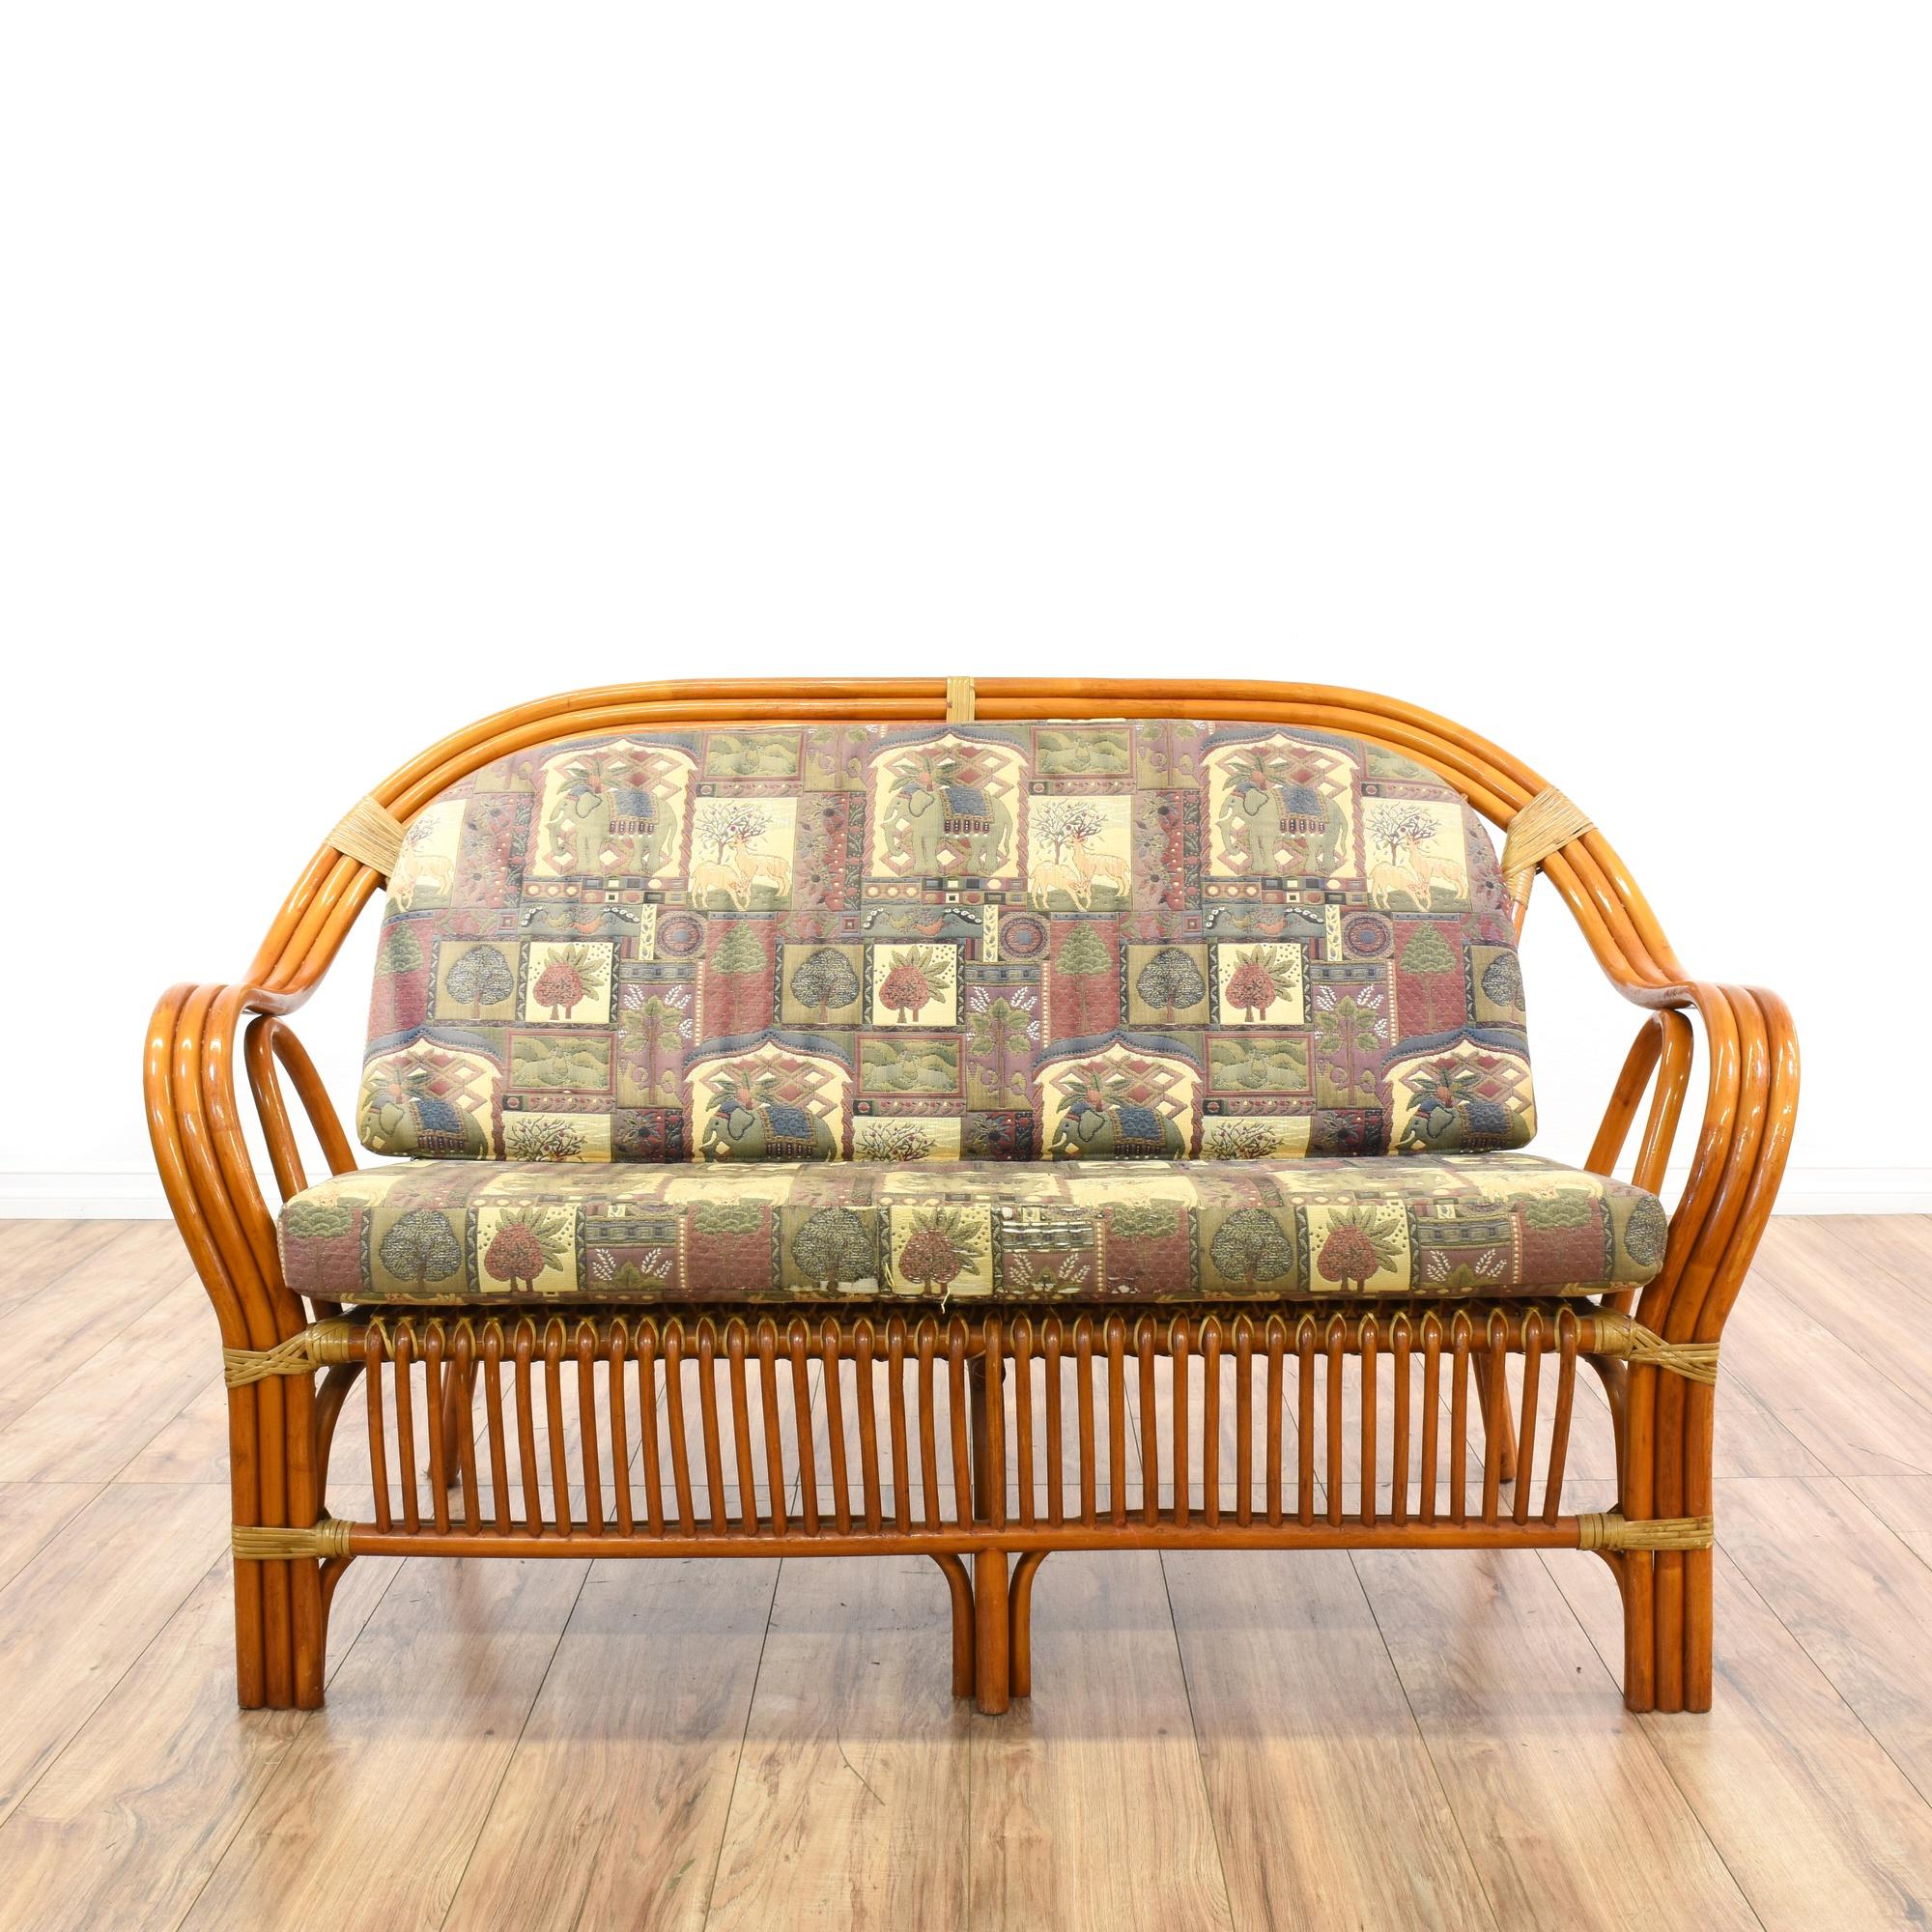 Bohemian Curved Rattan Loveseat Sofa